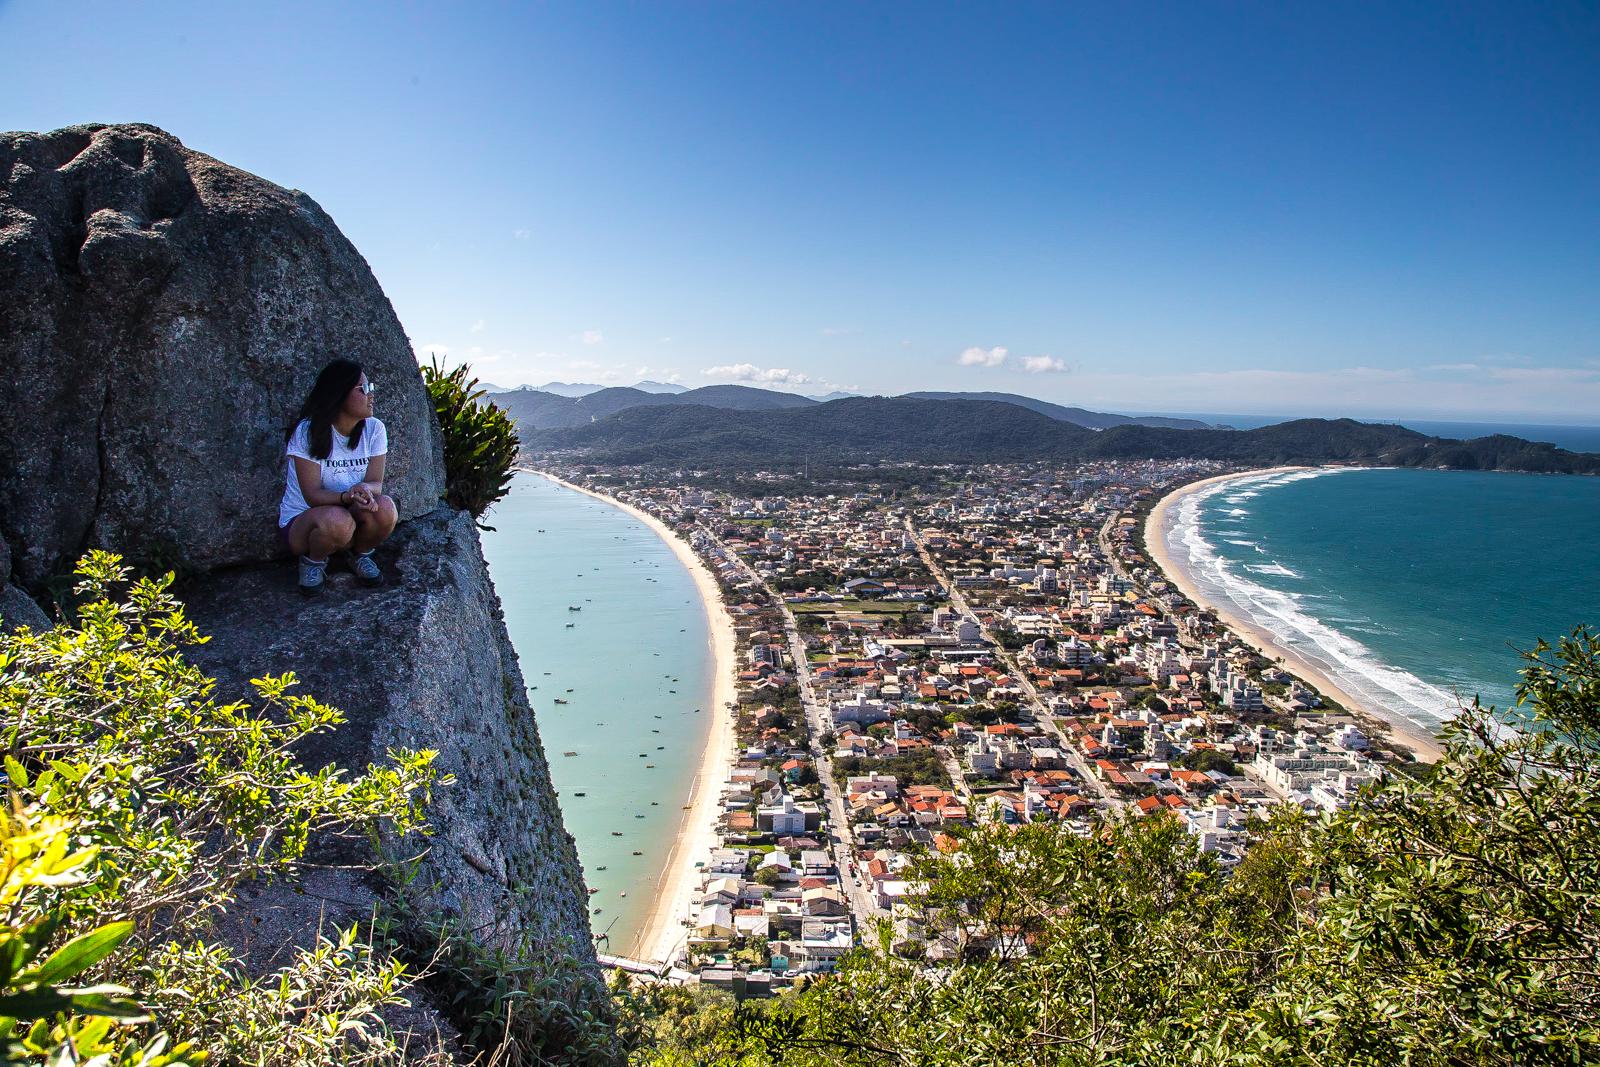 Julie perched on a rock in Bombinhas, Brazil